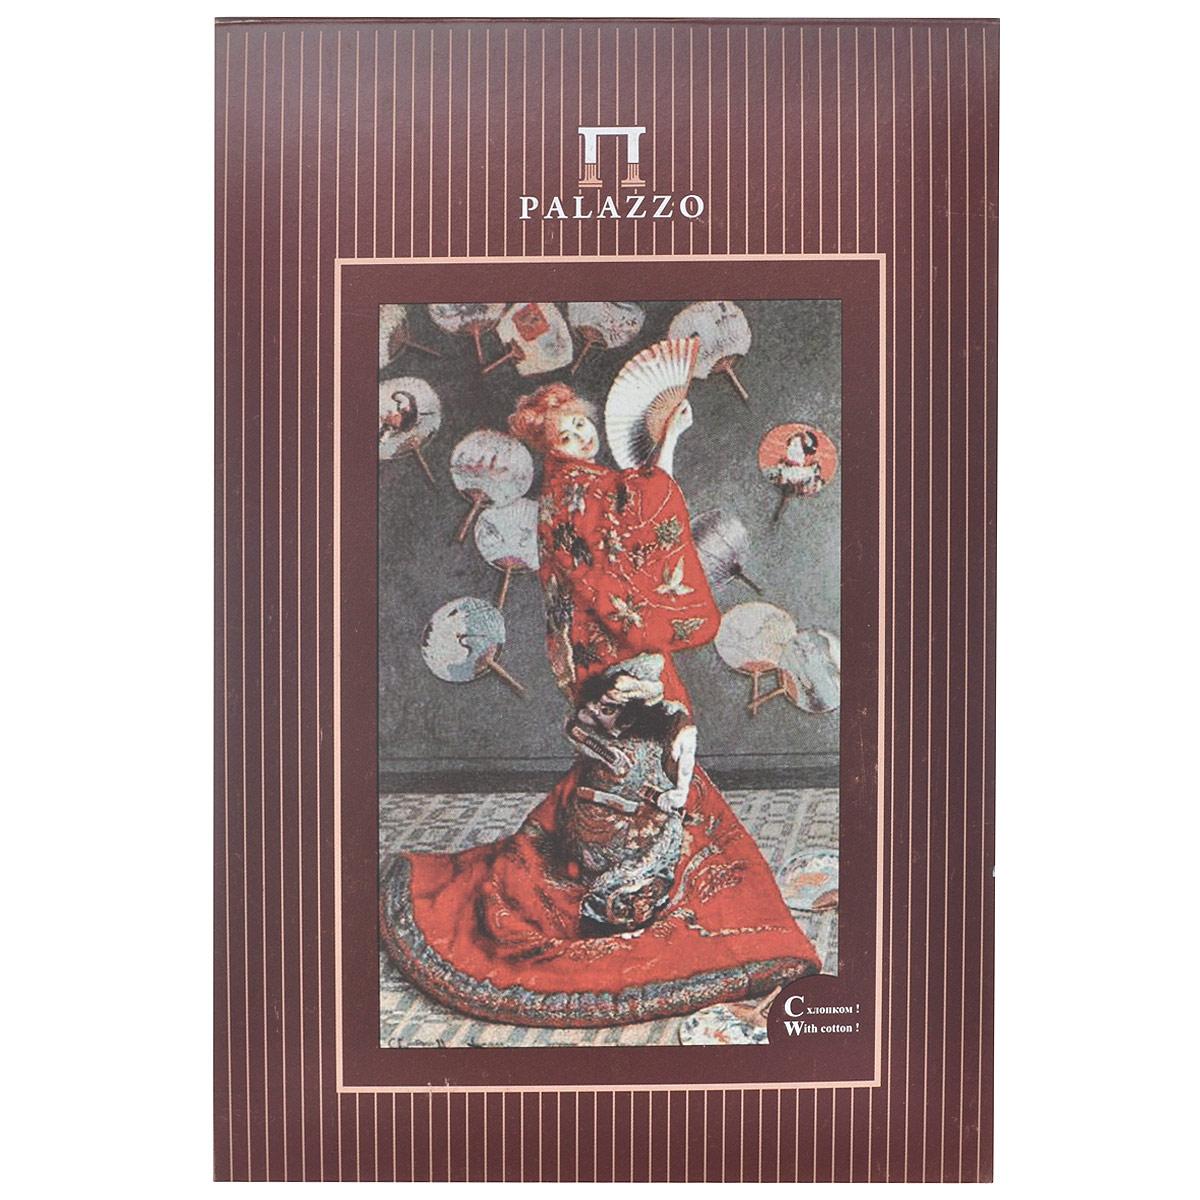 Планшет для акварели Palazzo К. Моне. Японка, формат А5, 20 листов альбом для акварели воронцовский дворец 20 листов а5 ал 6730